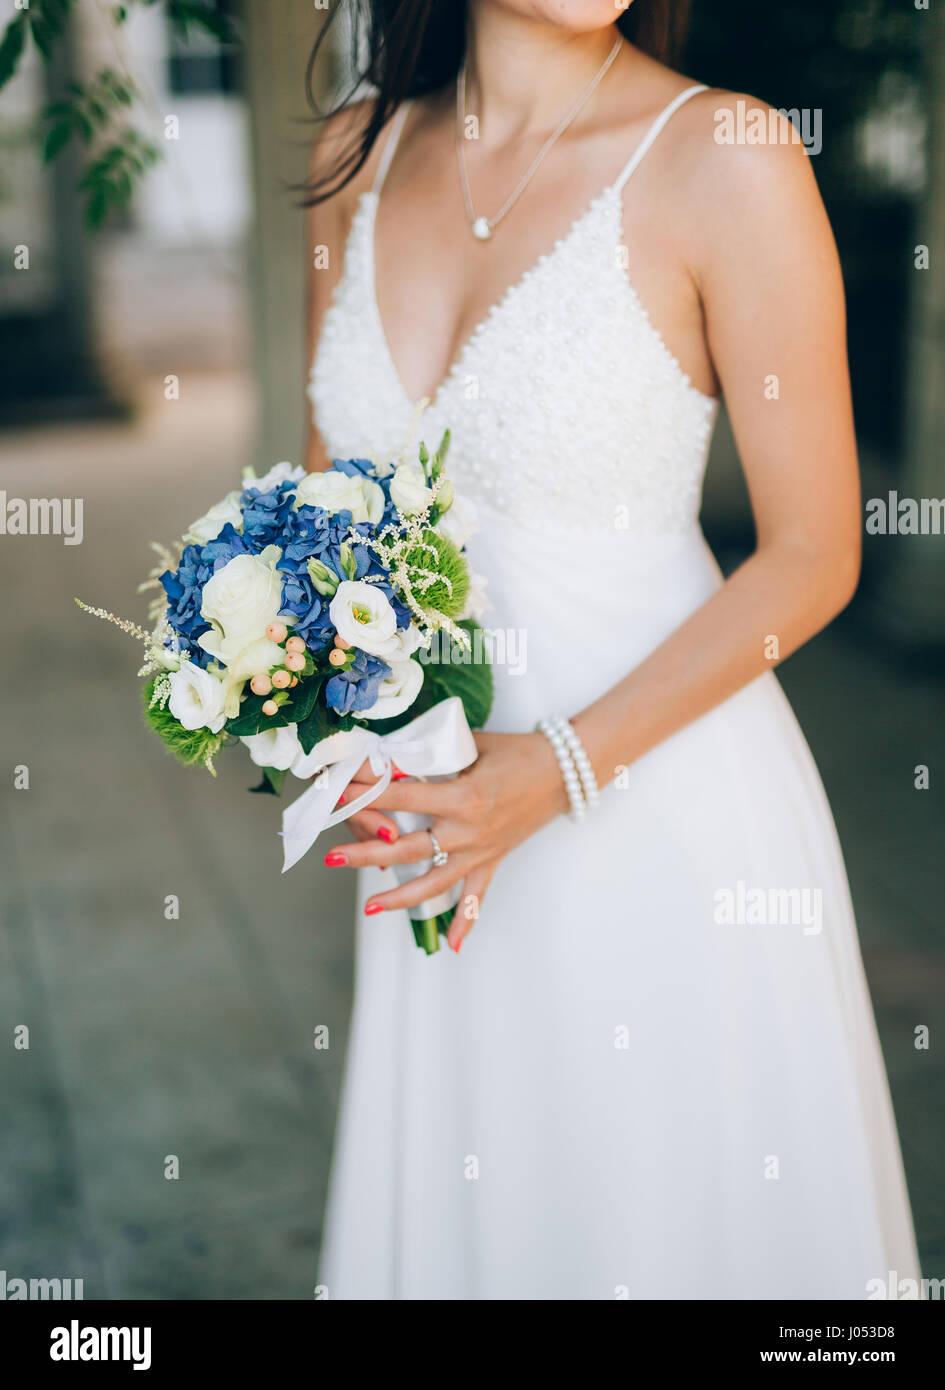 Bouquet Sposa Lisianthus.Wedding Bridal Bouquet Of Hydrangeas Astilba Lisianthus In The